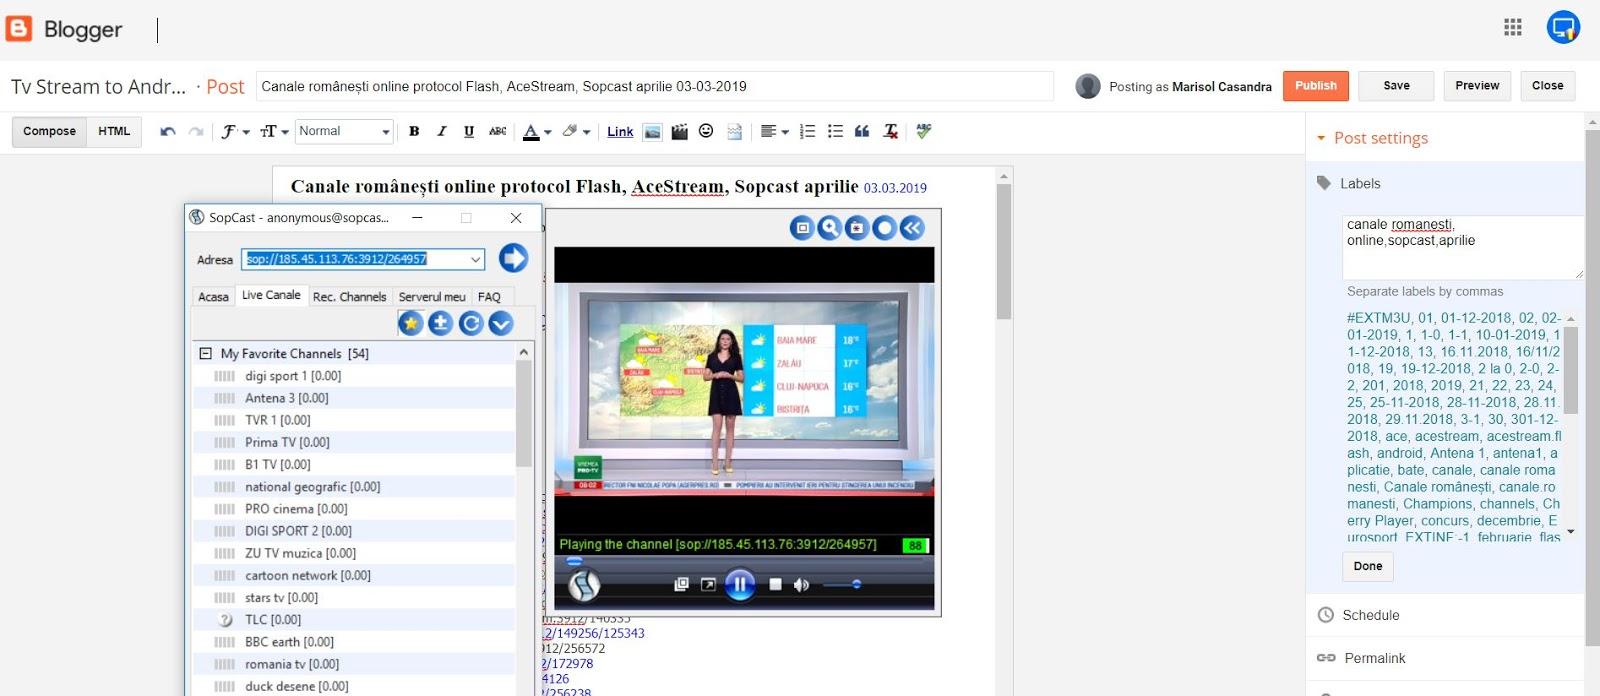 Antena 1 sopcast link